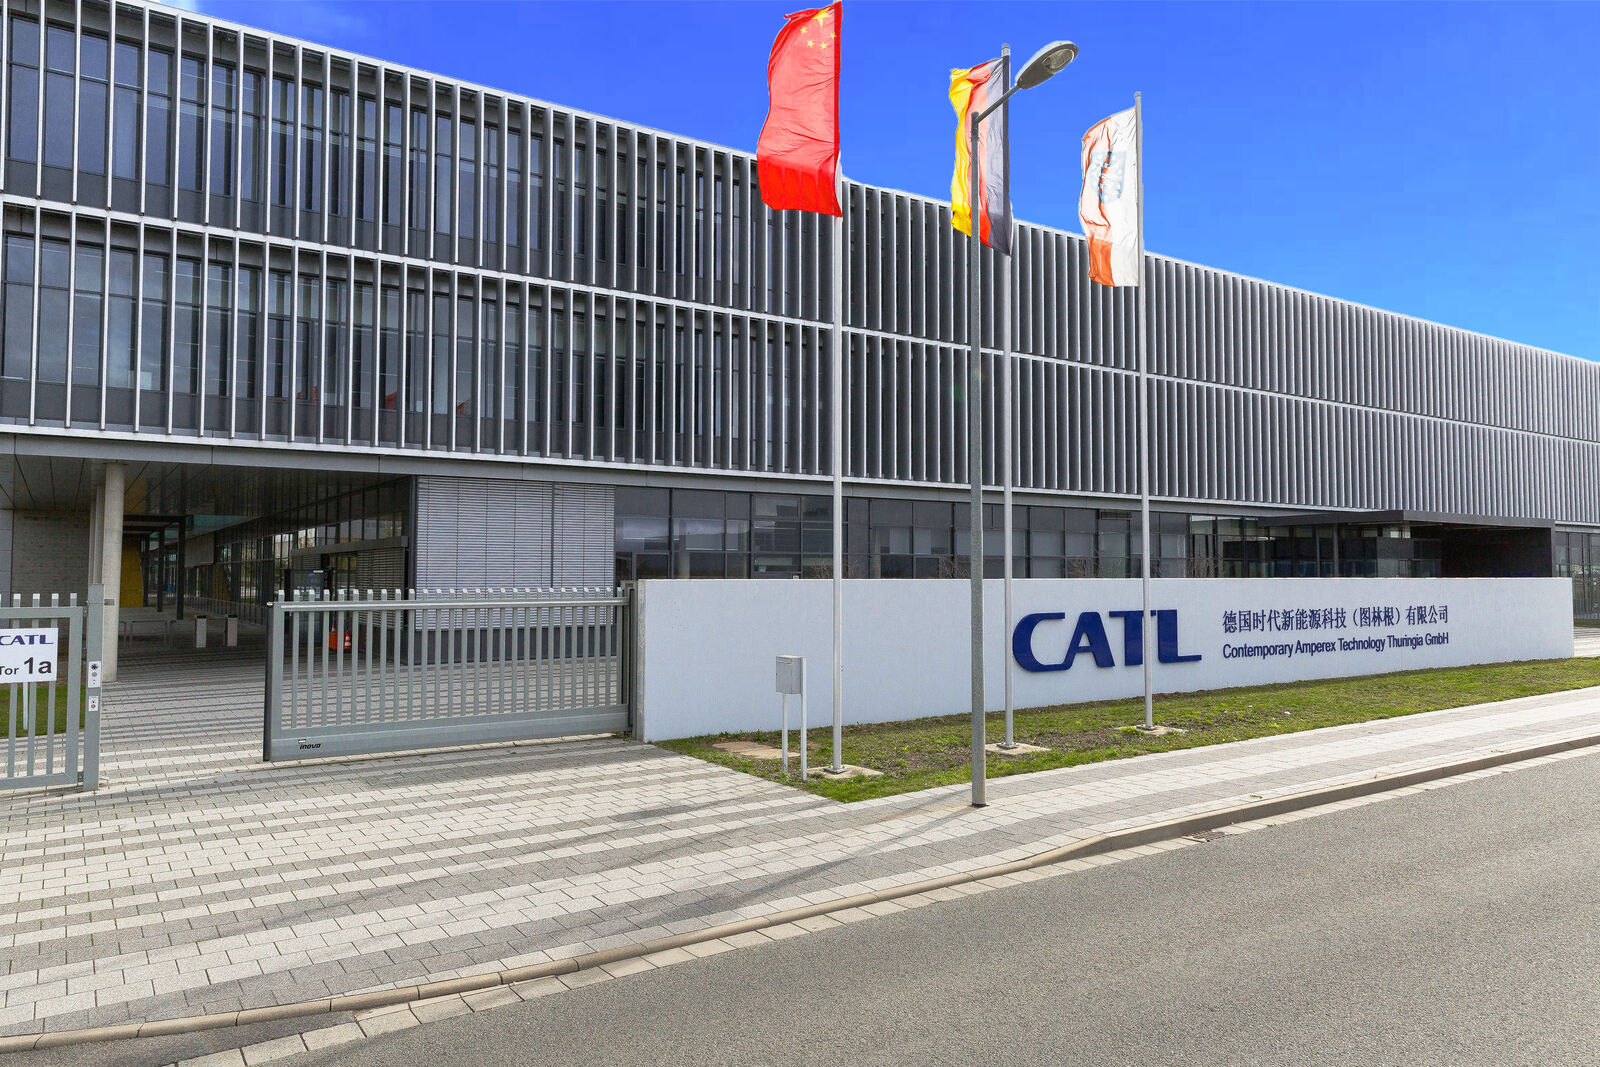 Experte Logistiksysteme (m/w/d) - Job Arnstadt - Karriere bei CATL